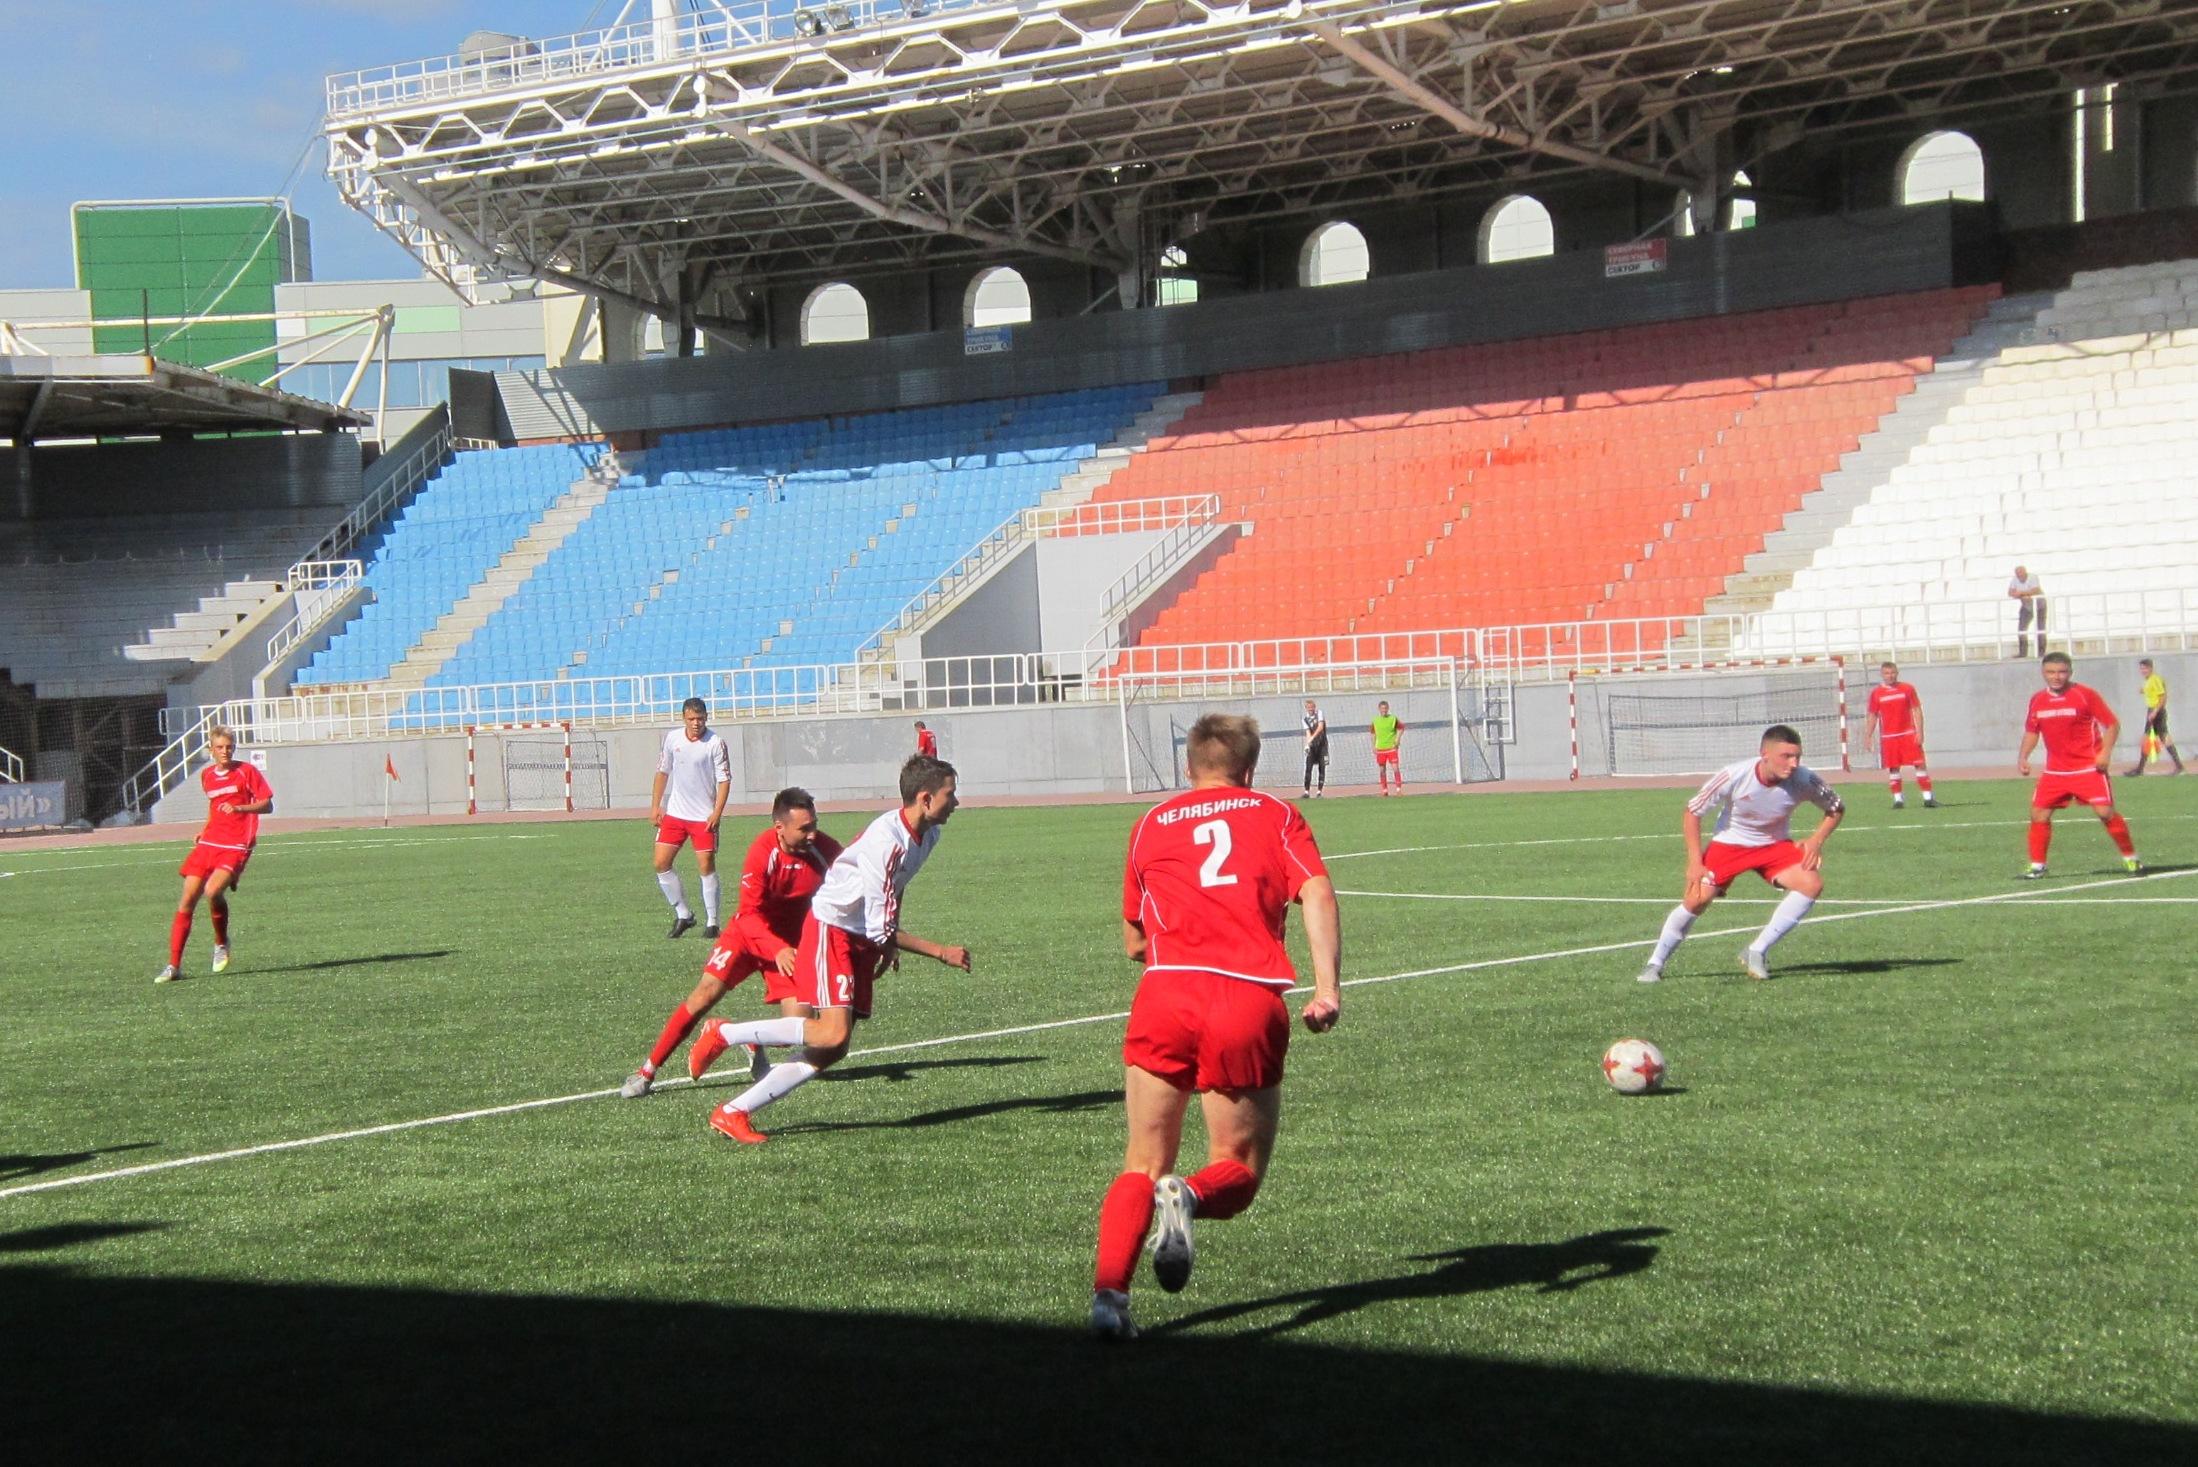 Академия футбола, Металлург Златоуст